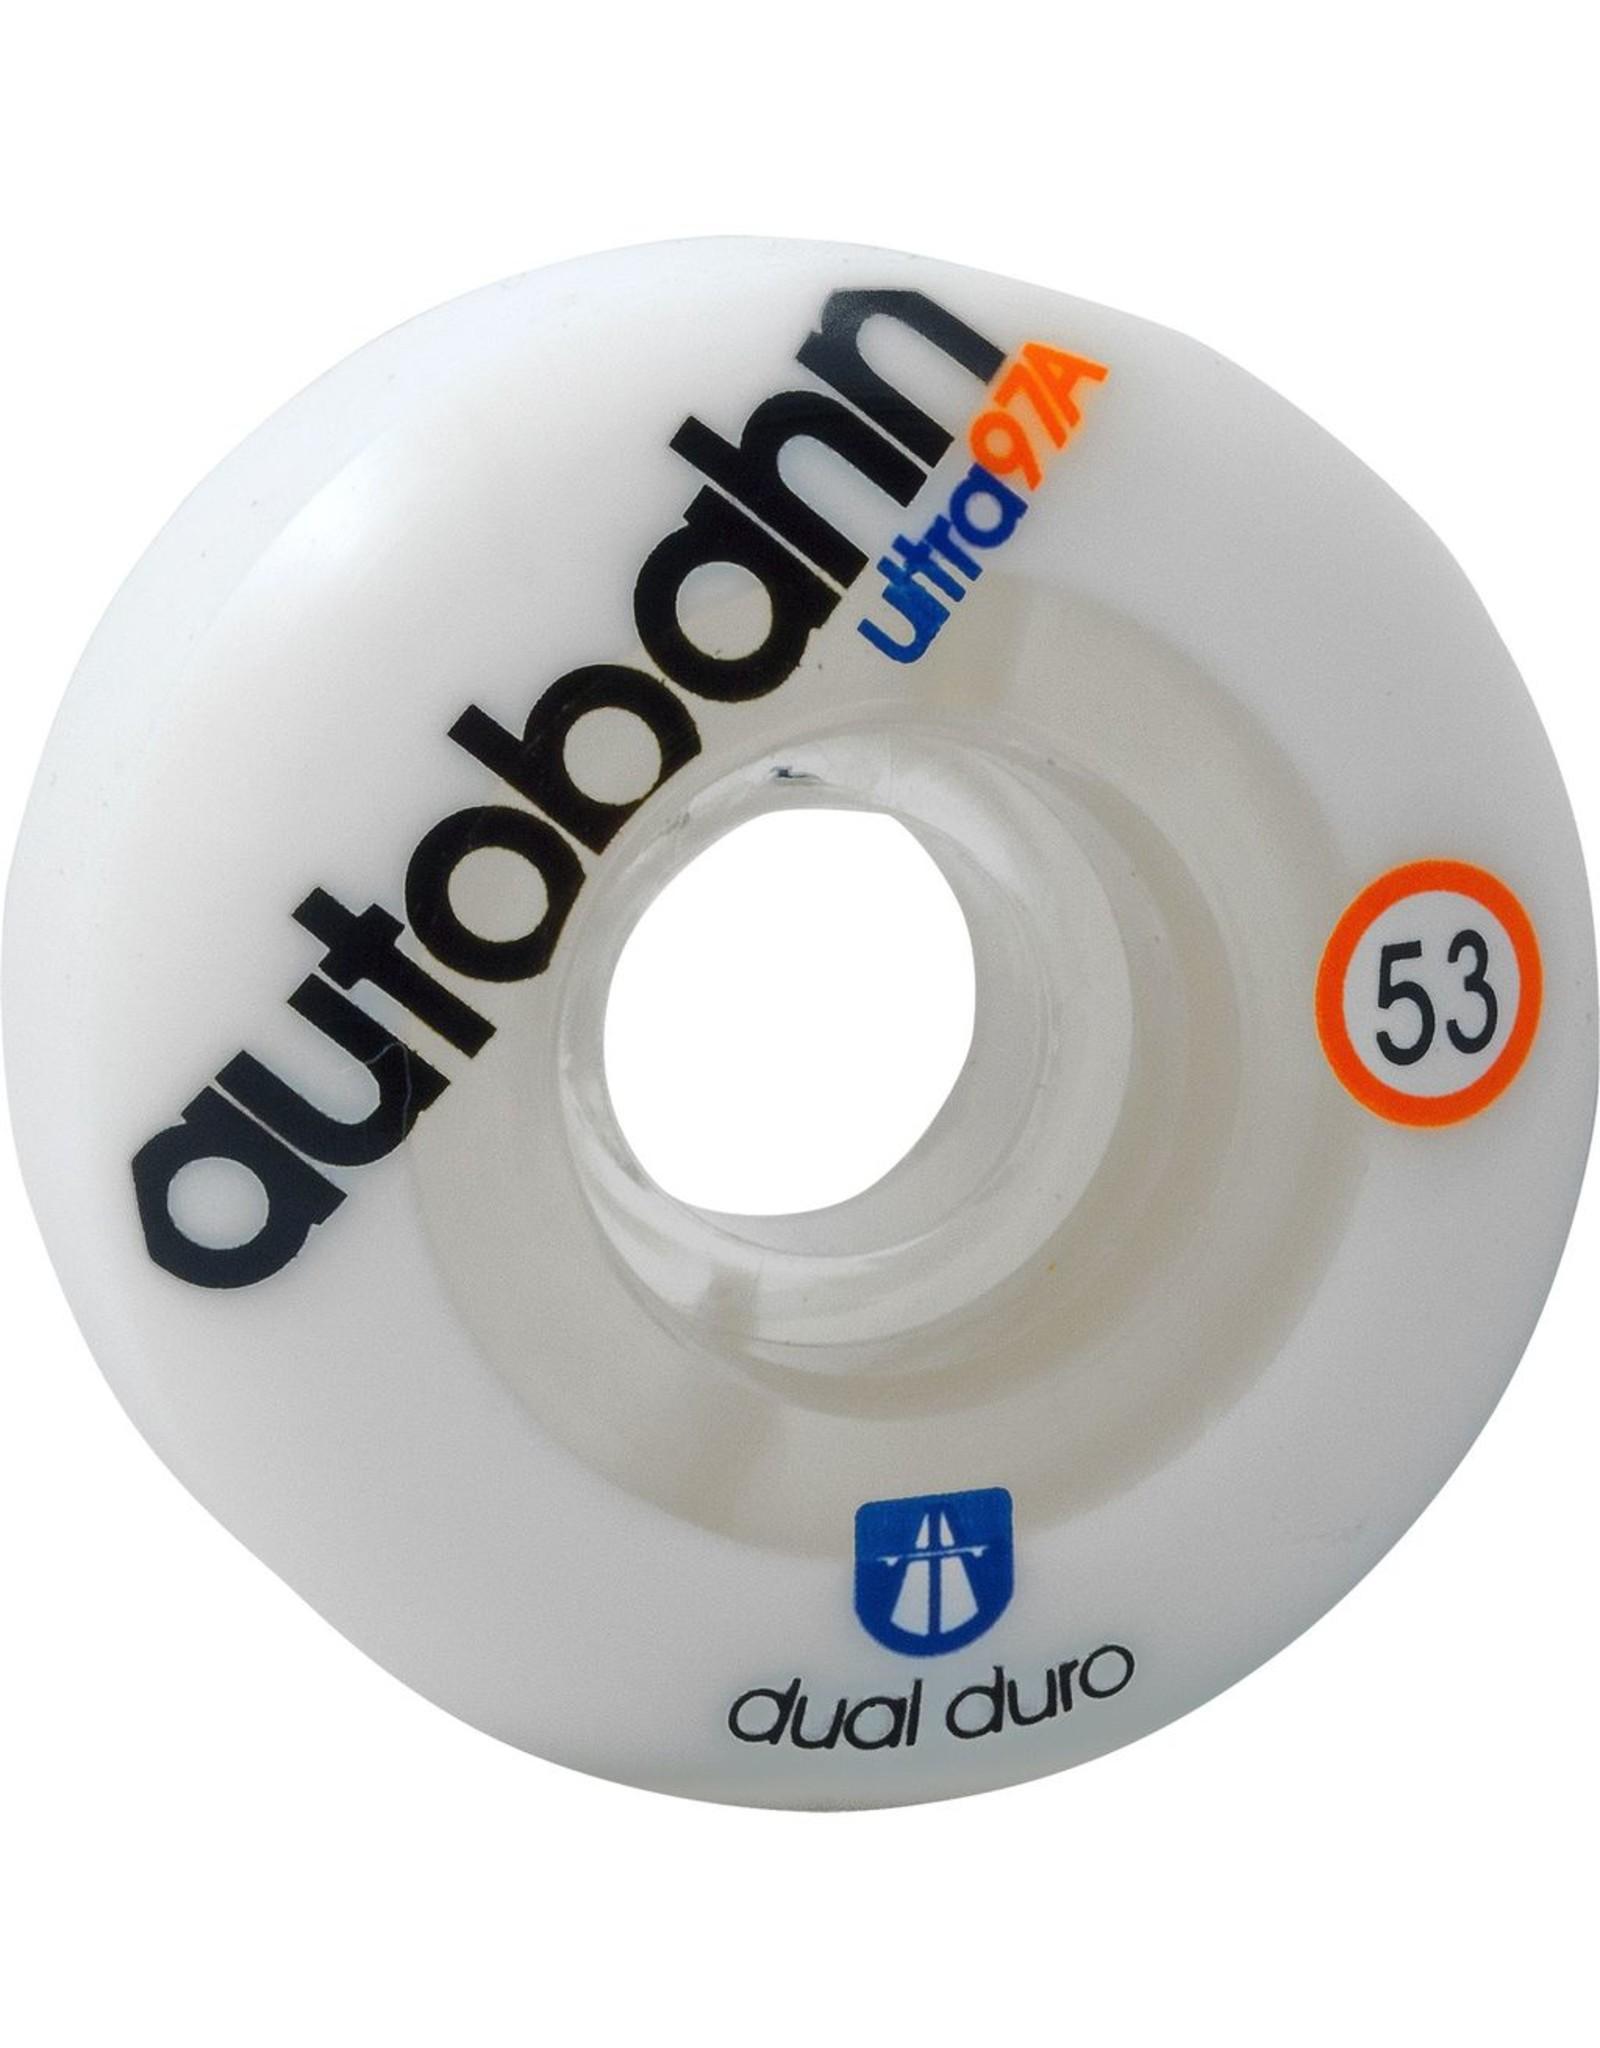 AUTOBAHN AUTOBAHN DUAL DUROMETER ULTRA 53mm 97a WHT/CLR